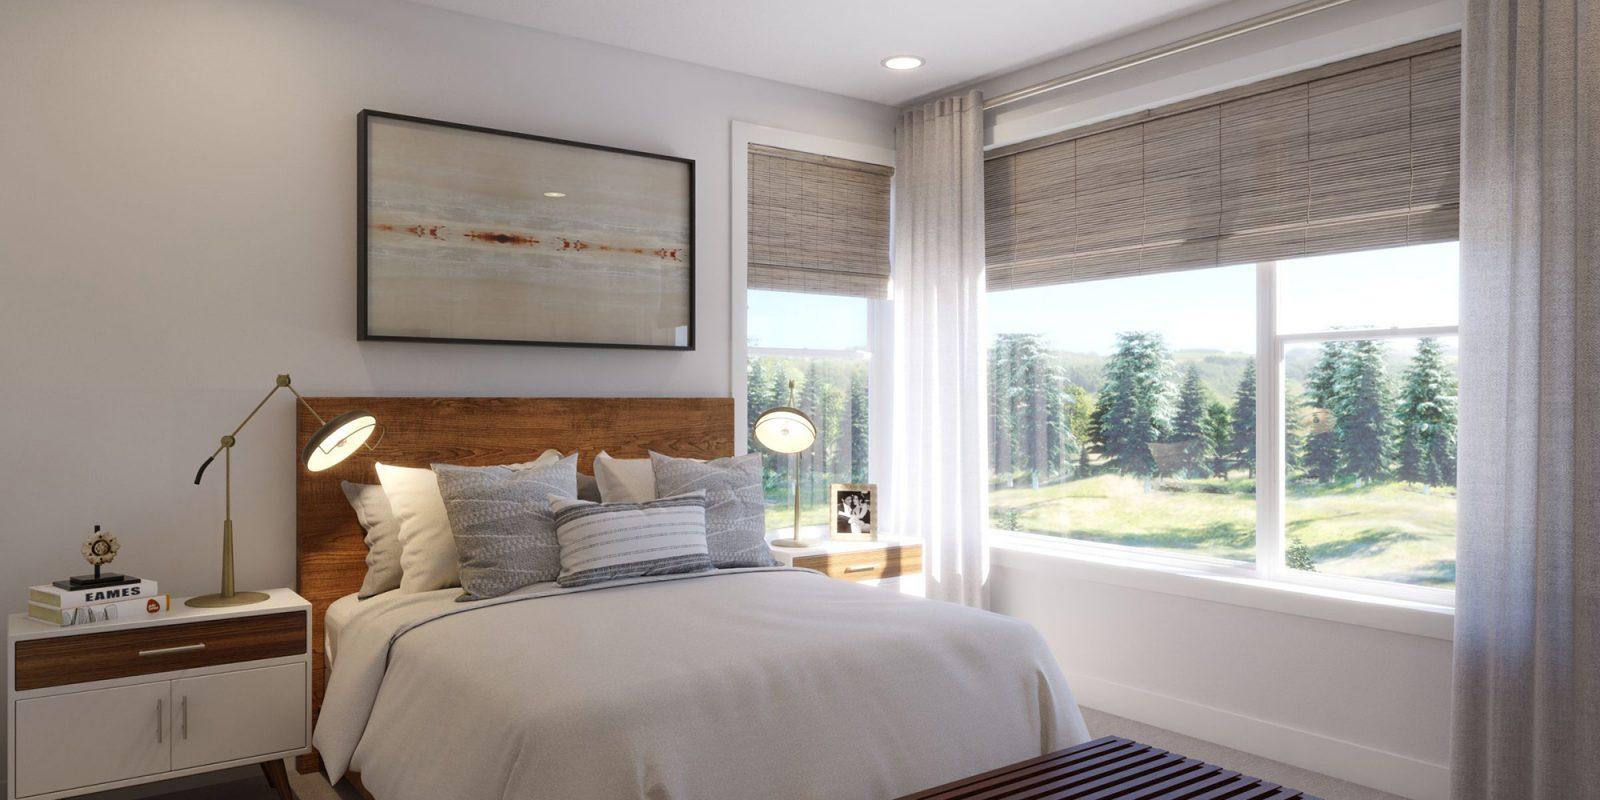 Baseline DoMore Rows: Haven - Master Bedroom